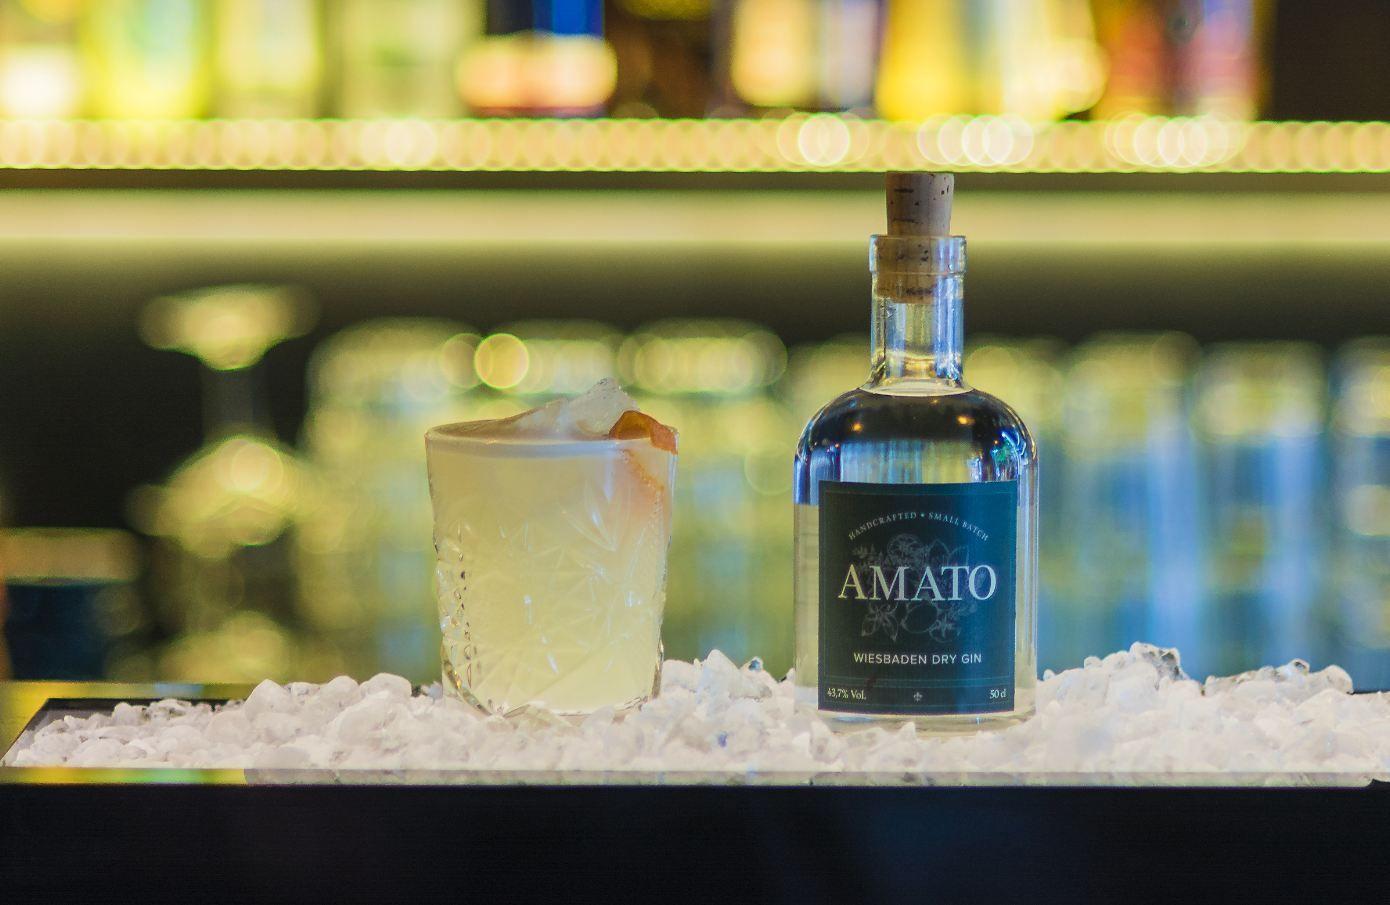 Amato Sour | Hausbar | Pinterest | Wiesbaden, Gin and Bartenders